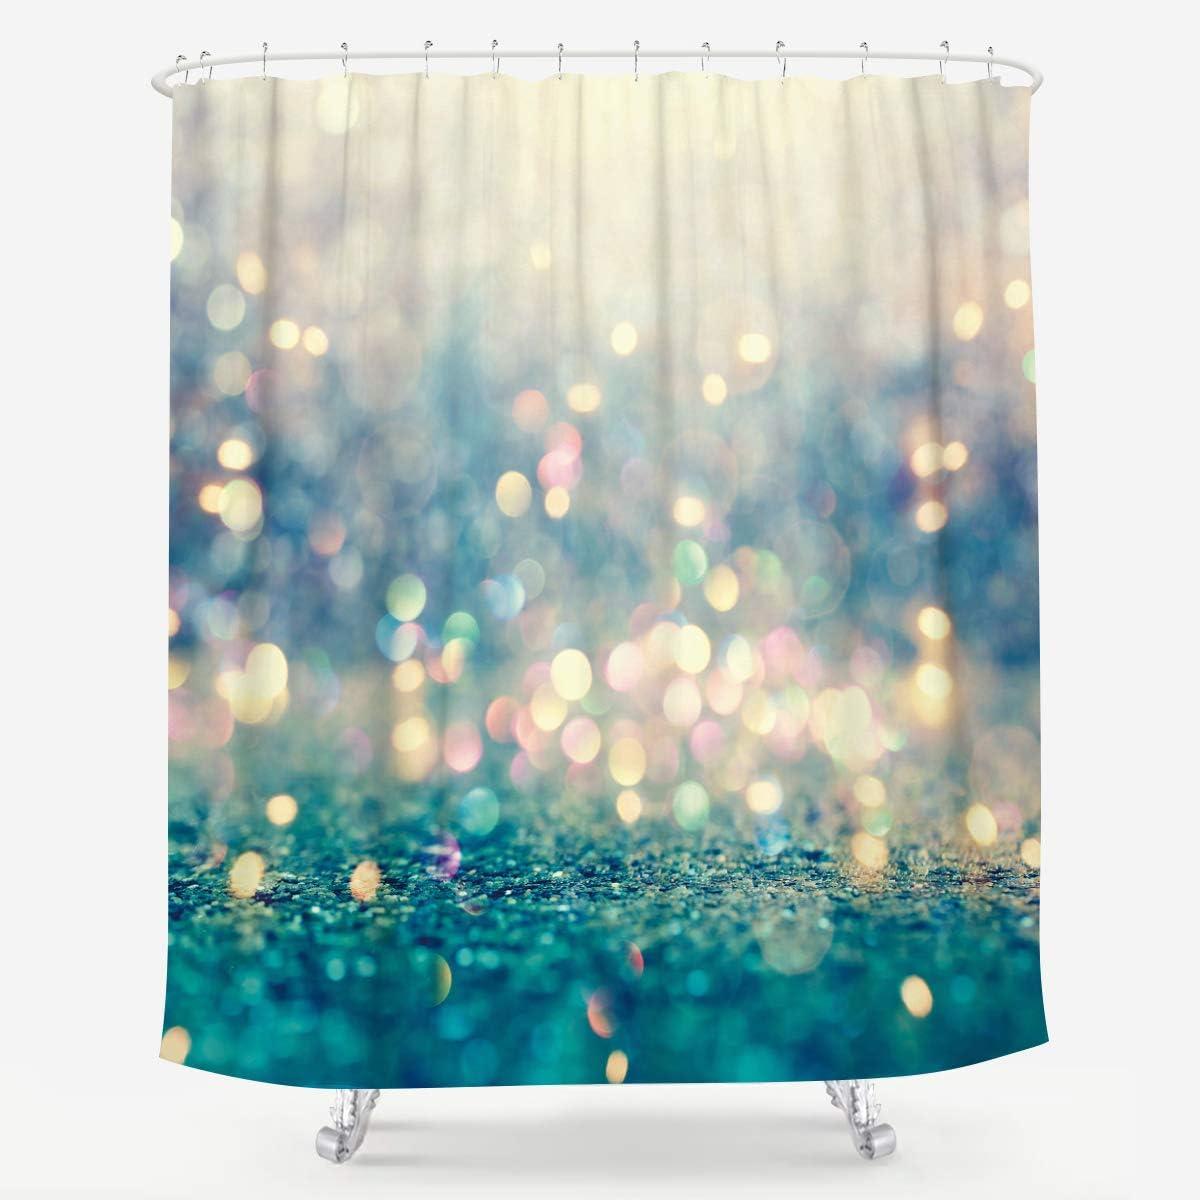 LIGHTINHOME Blue Golden Bokeh Shiny Shower Curtain (No Glitter) Polka Dots Sparkle Abstract Fabric Waterproof Home Bathtub Decor 12 Pack Plastic Hook 72x72 Inch